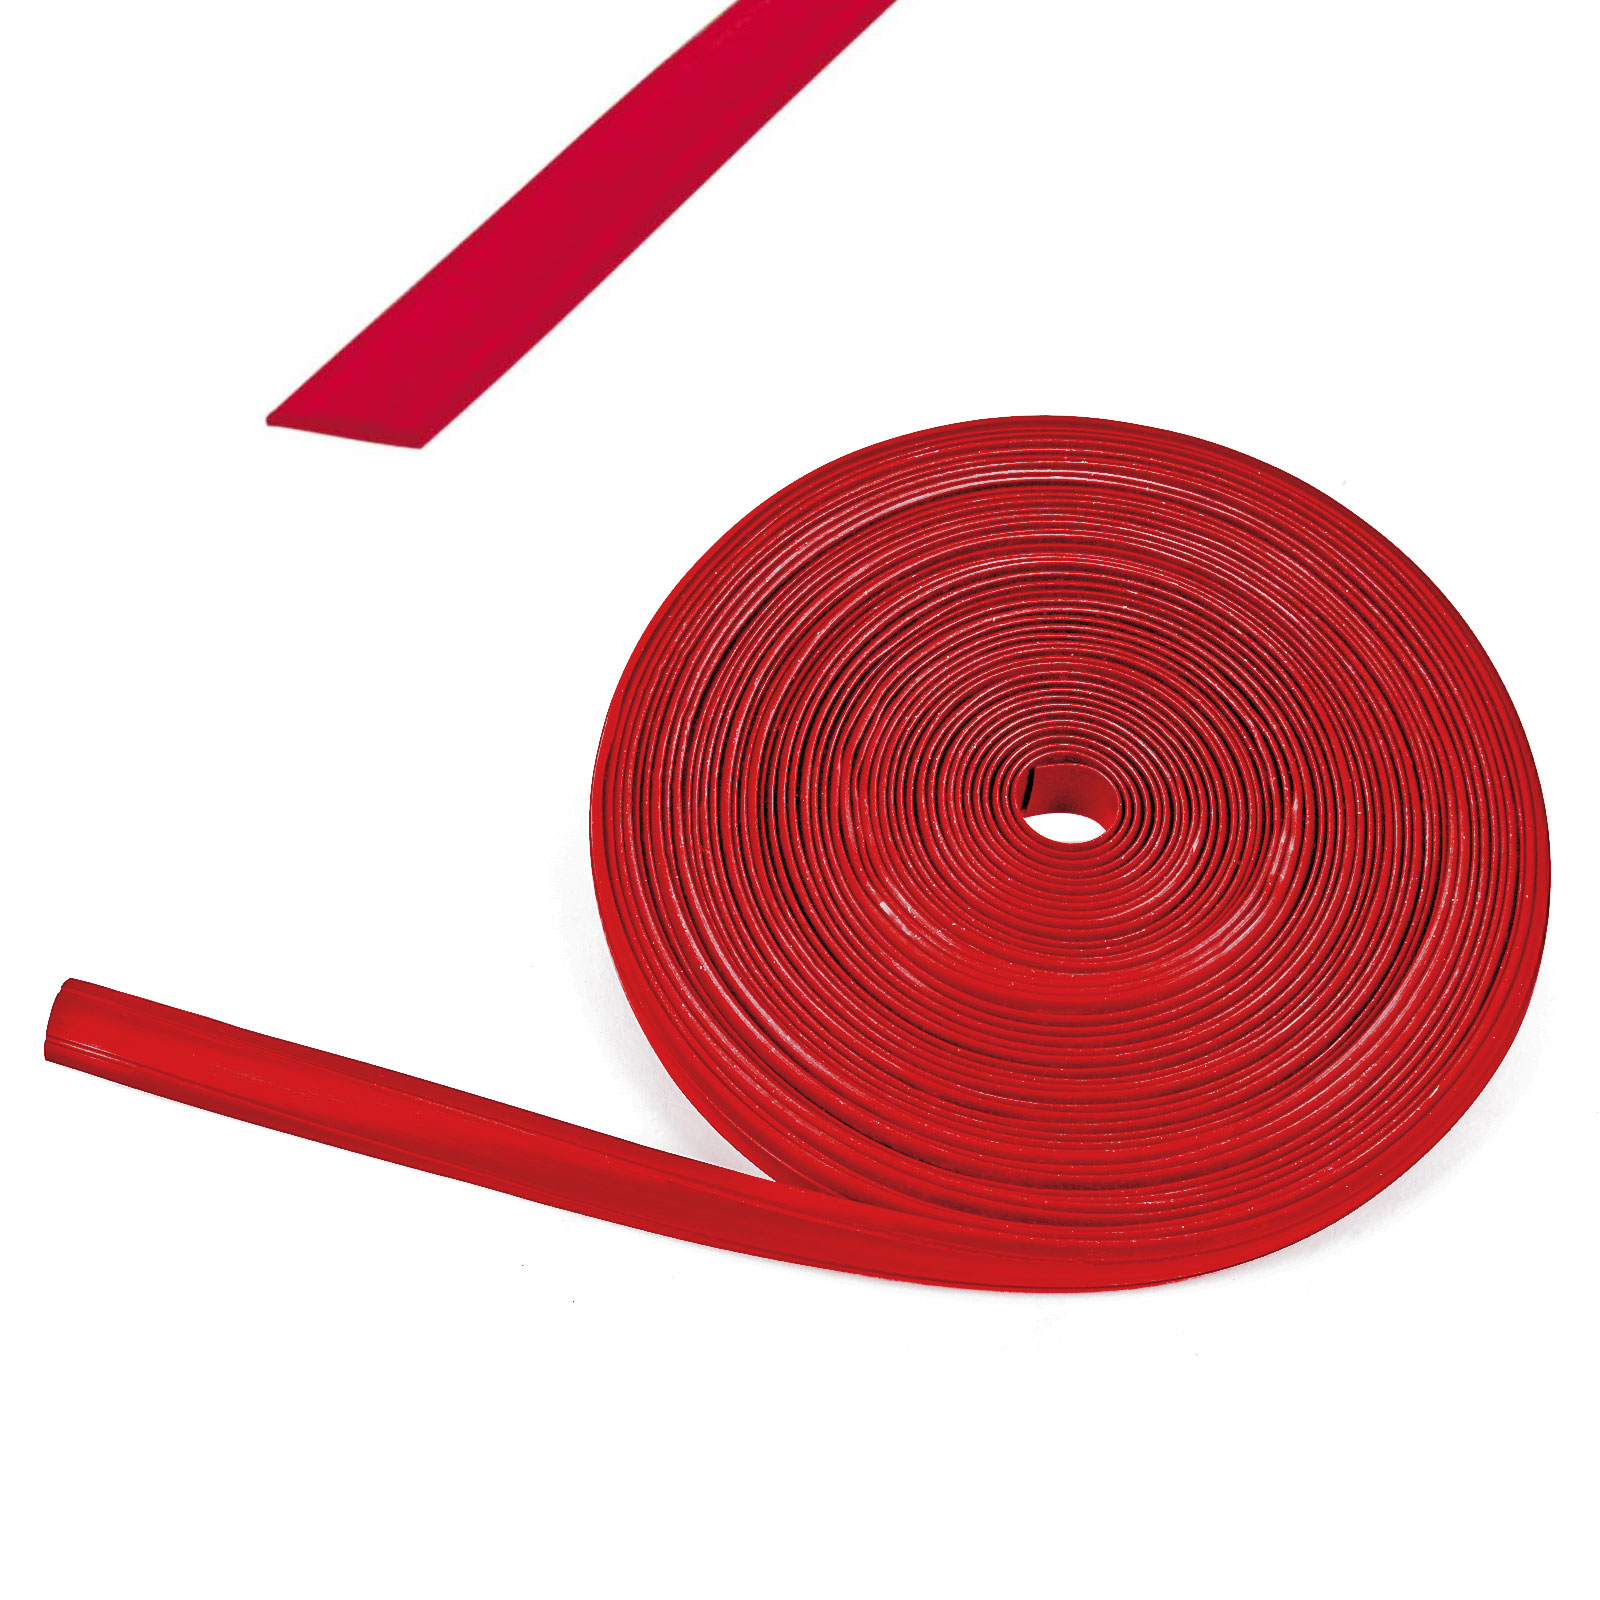 30 Meter (3x10 m) Kederband 12 mm rot Kunststoff Leistenfüller